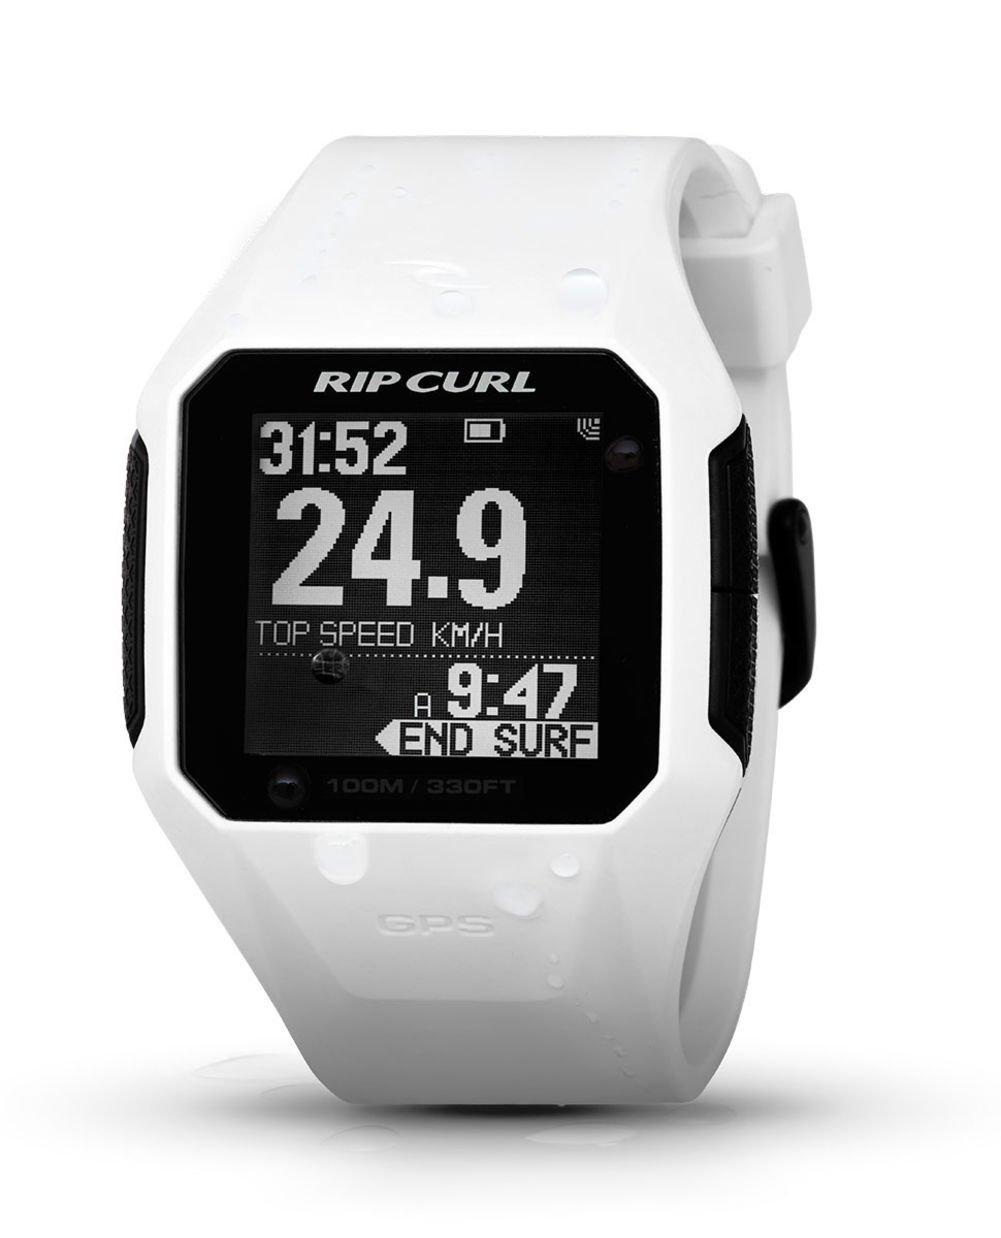 RIP CURL SearchGPS Smart Surf Watch In White A1111